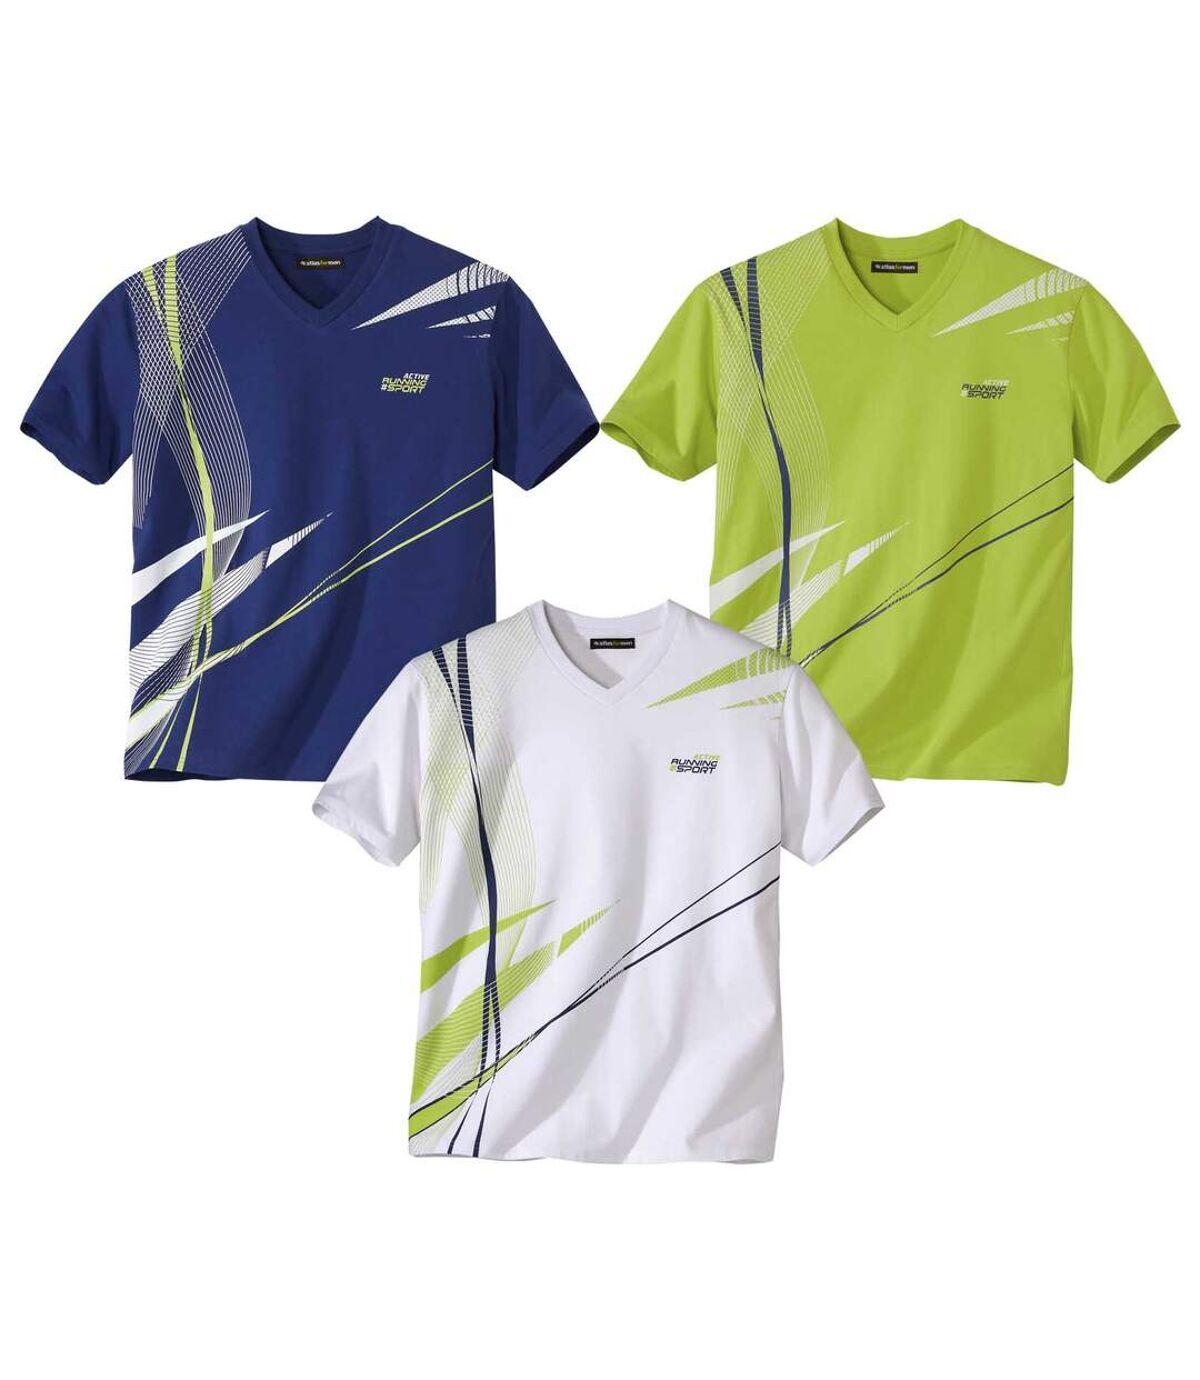 3er-Pack sportliche T-Shirts Atlas For Men